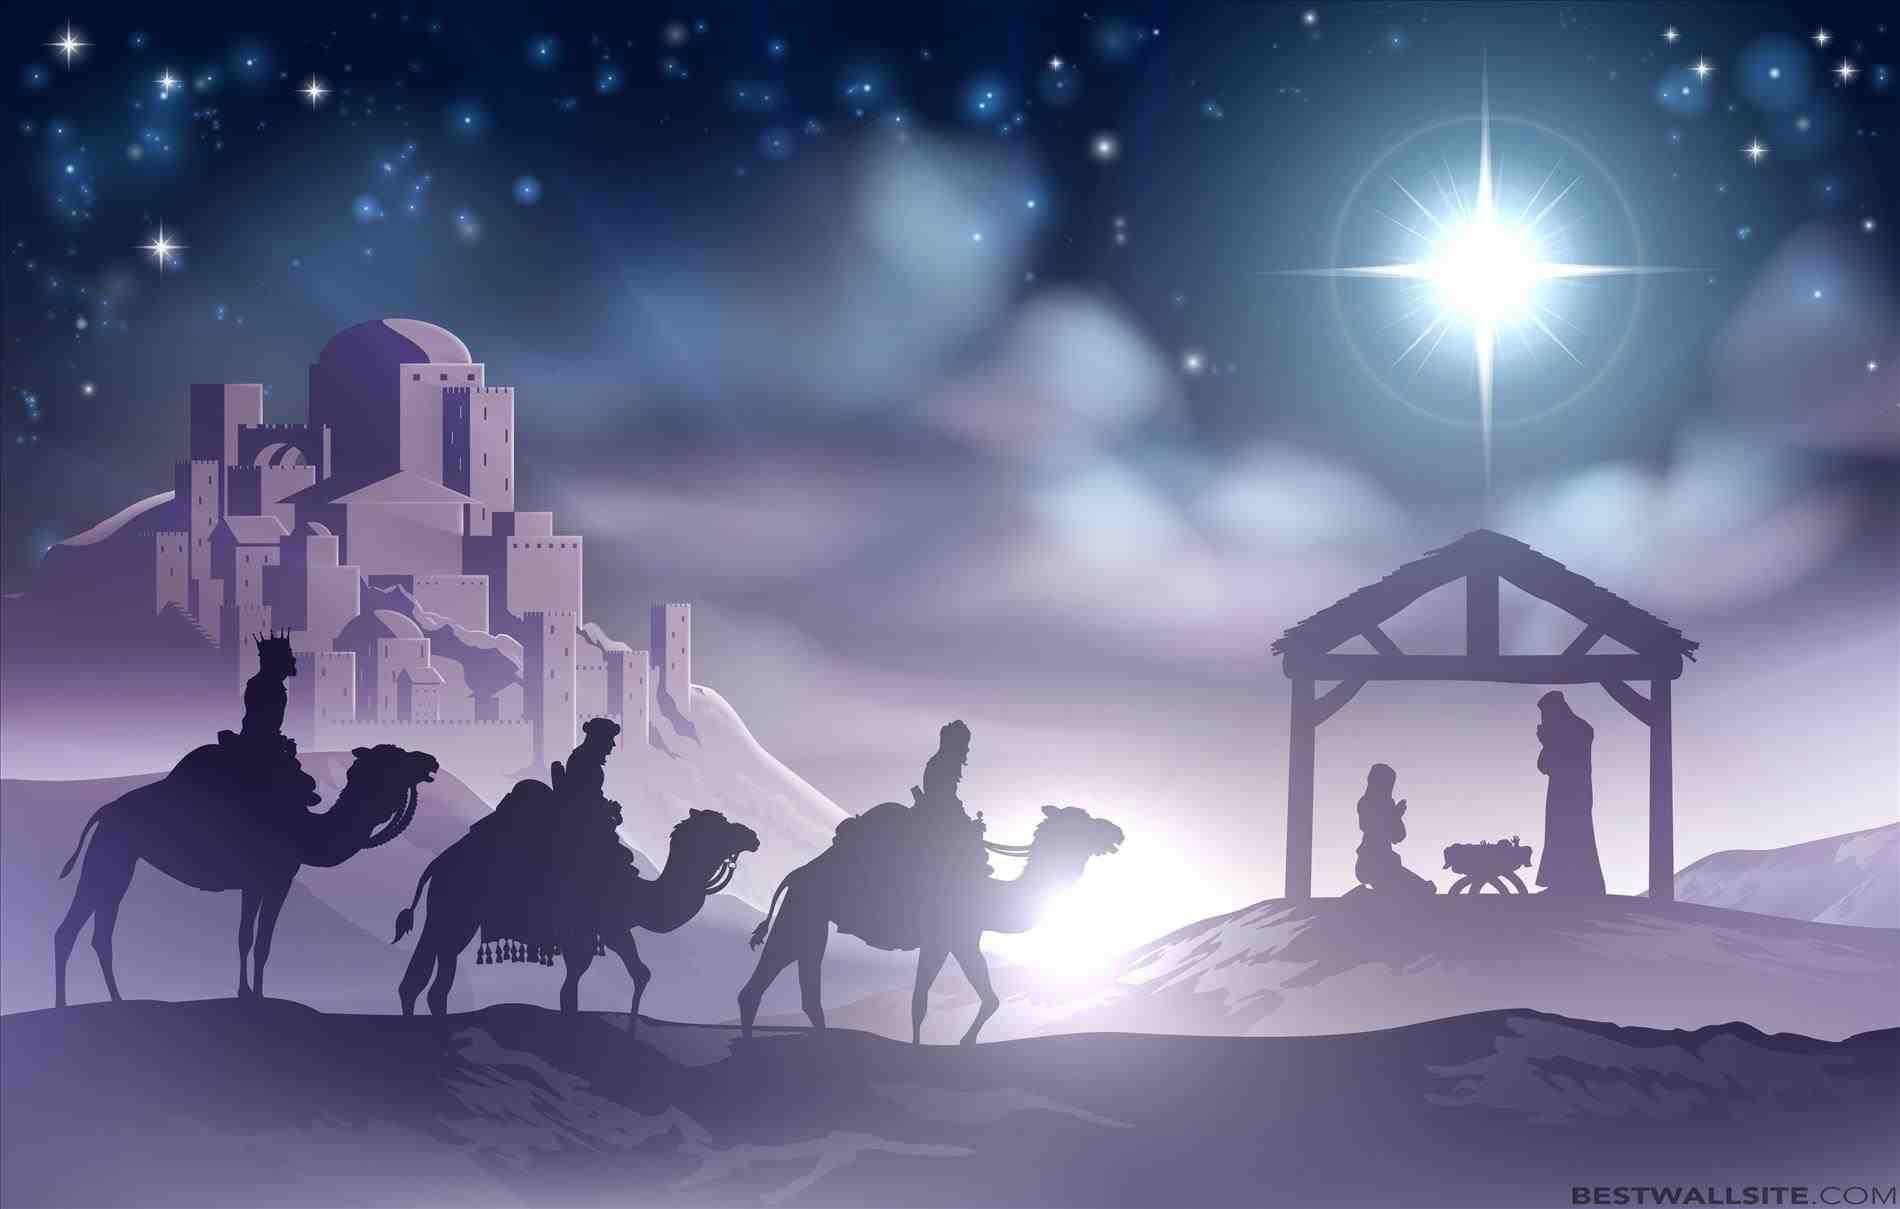 New Post Christmas Nativity Wallpaper Hd Trendingchemineewebsite